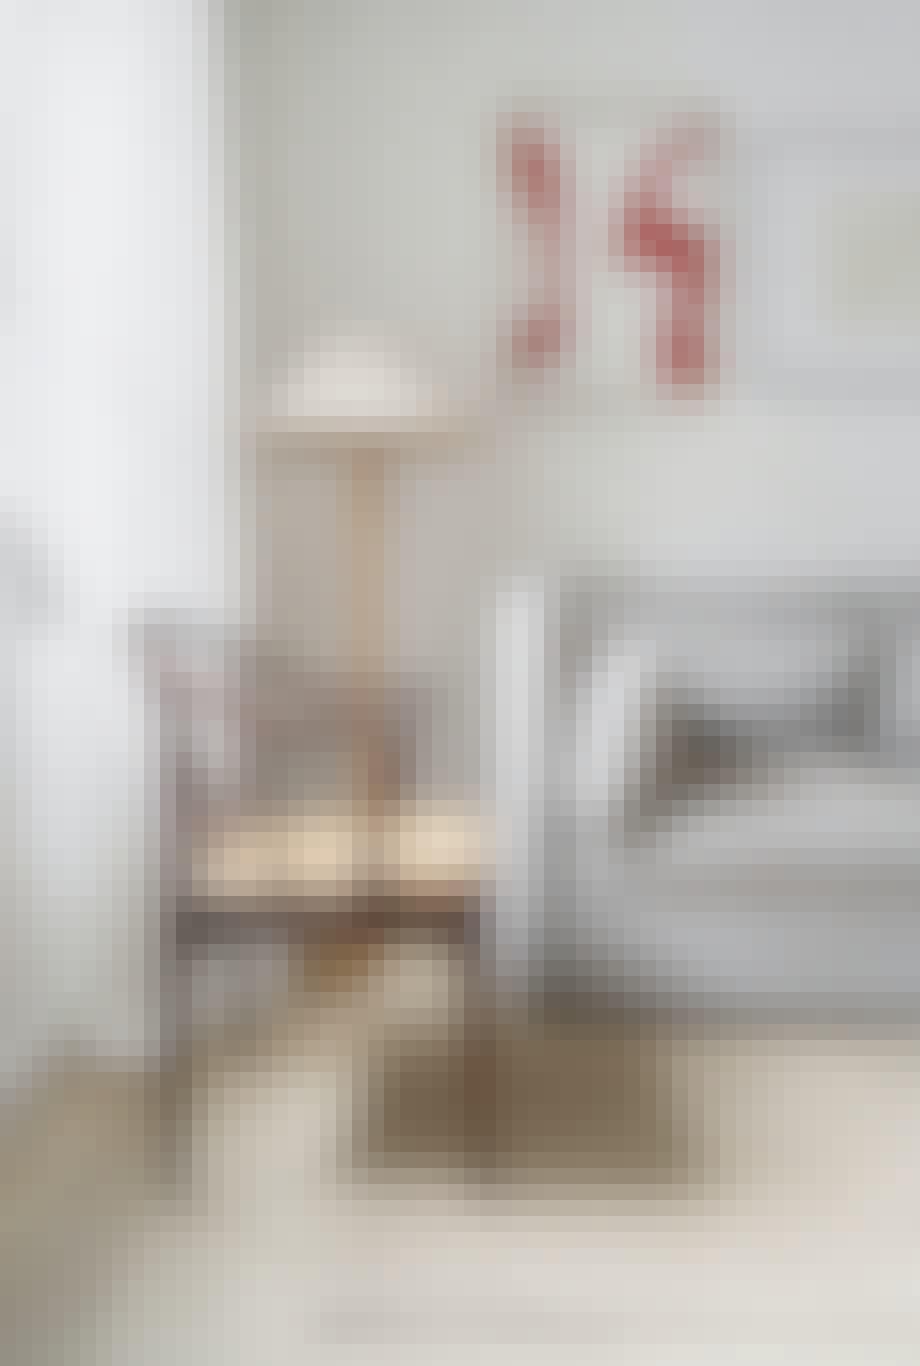 Detaljer fra stue